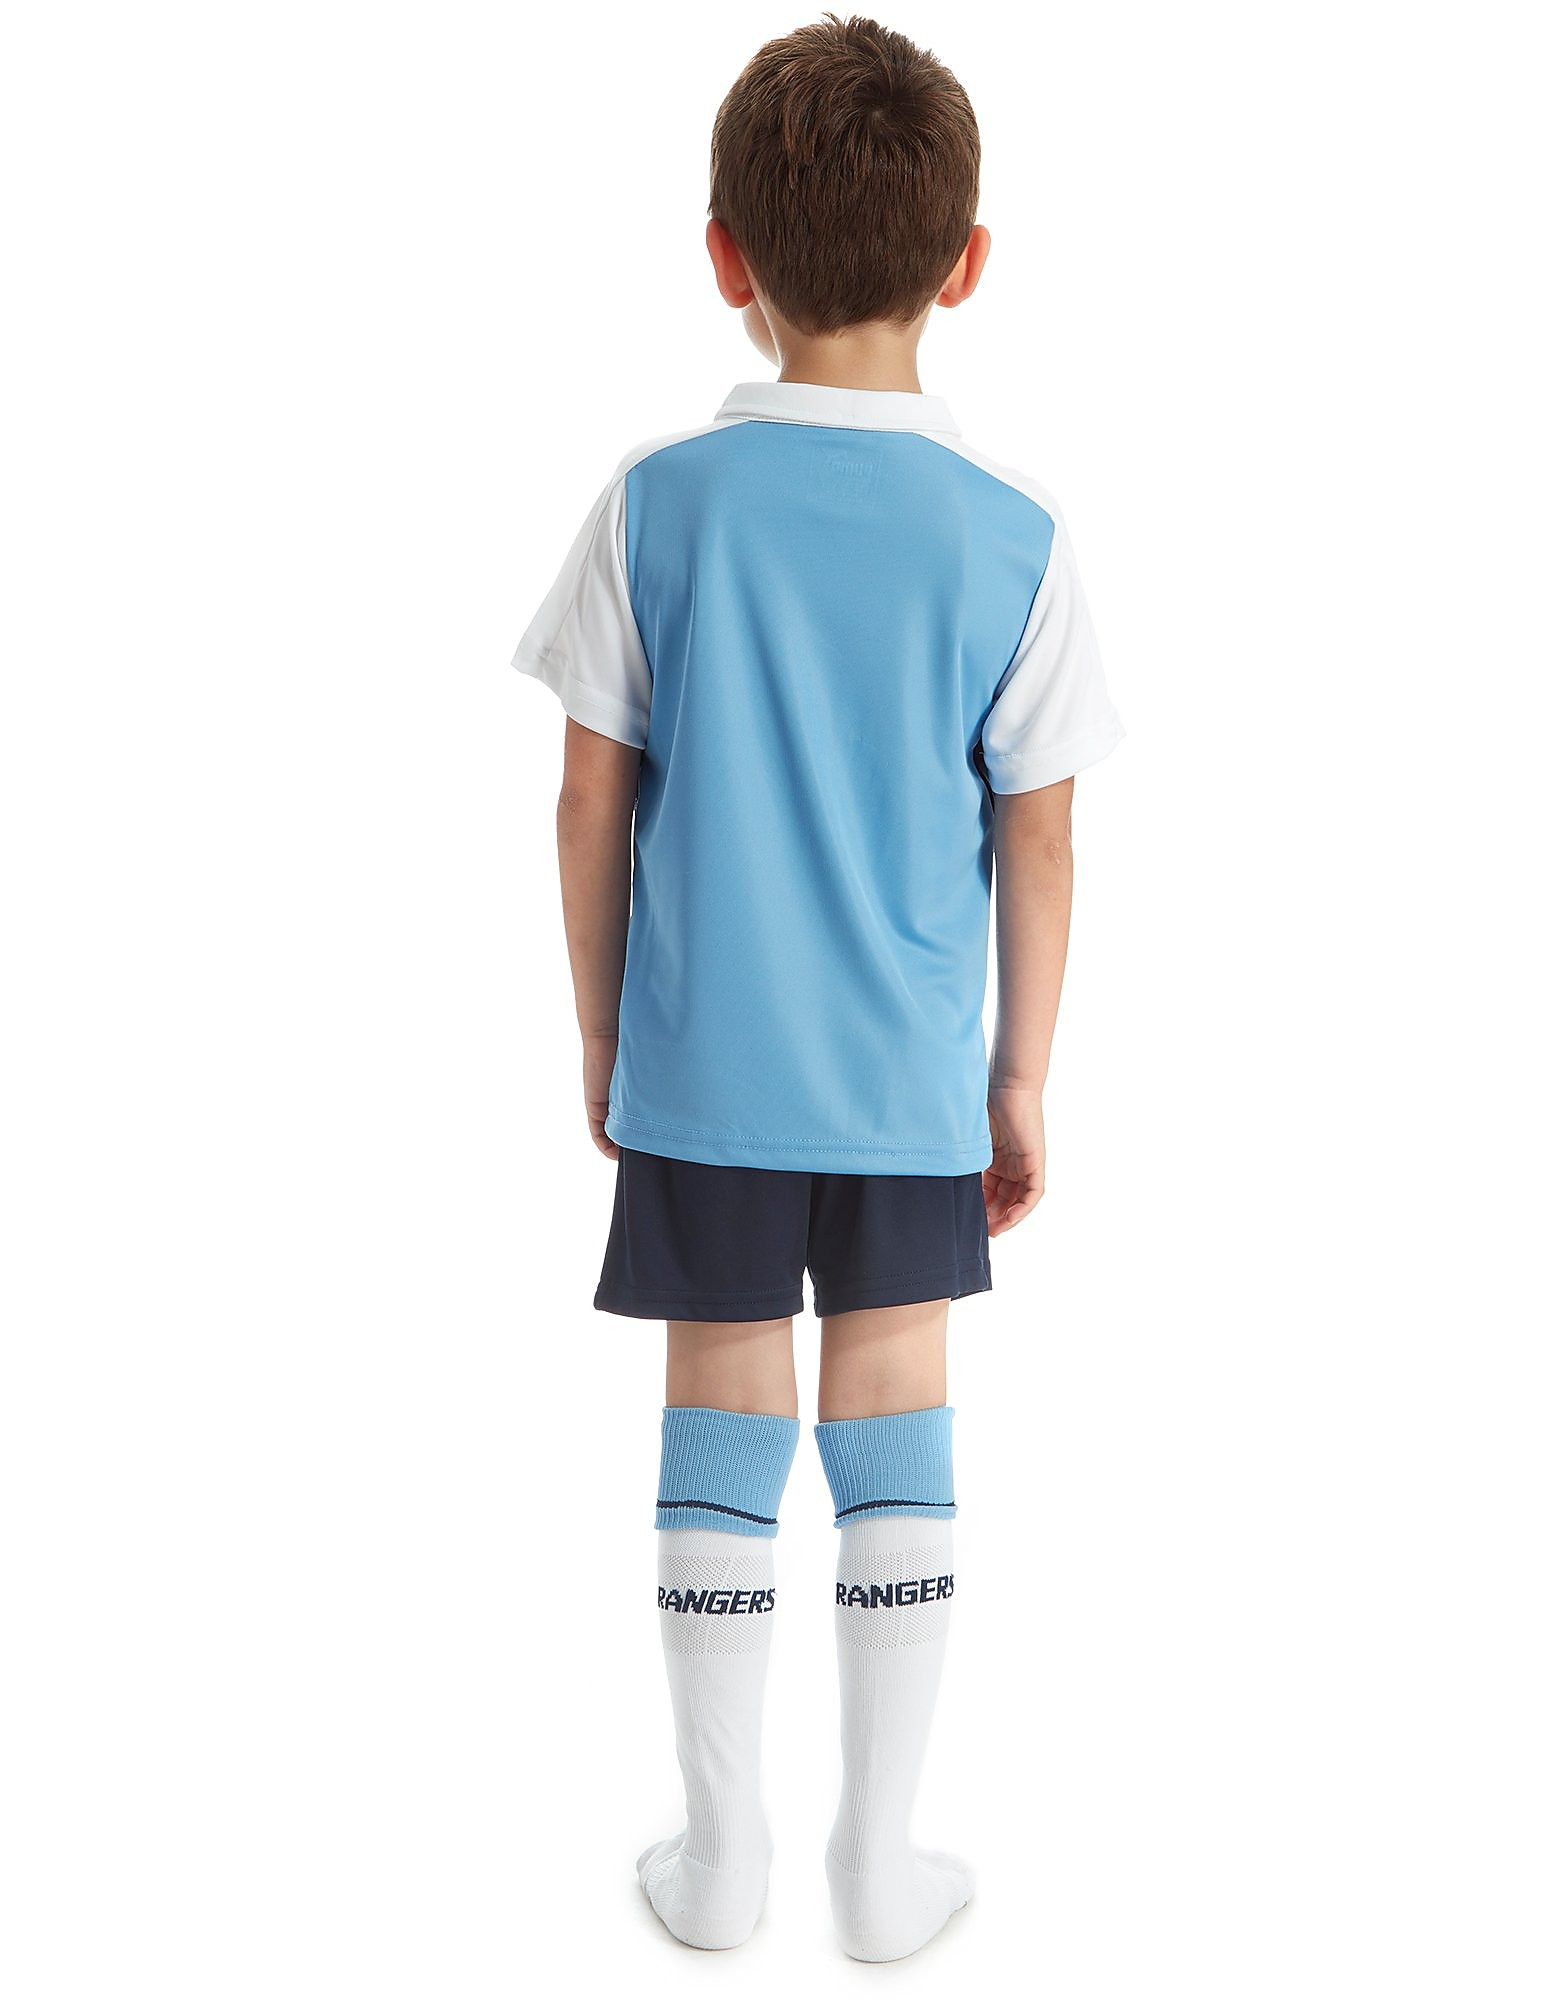 PUMA Rangers FC 2016/17 Third Kit Children